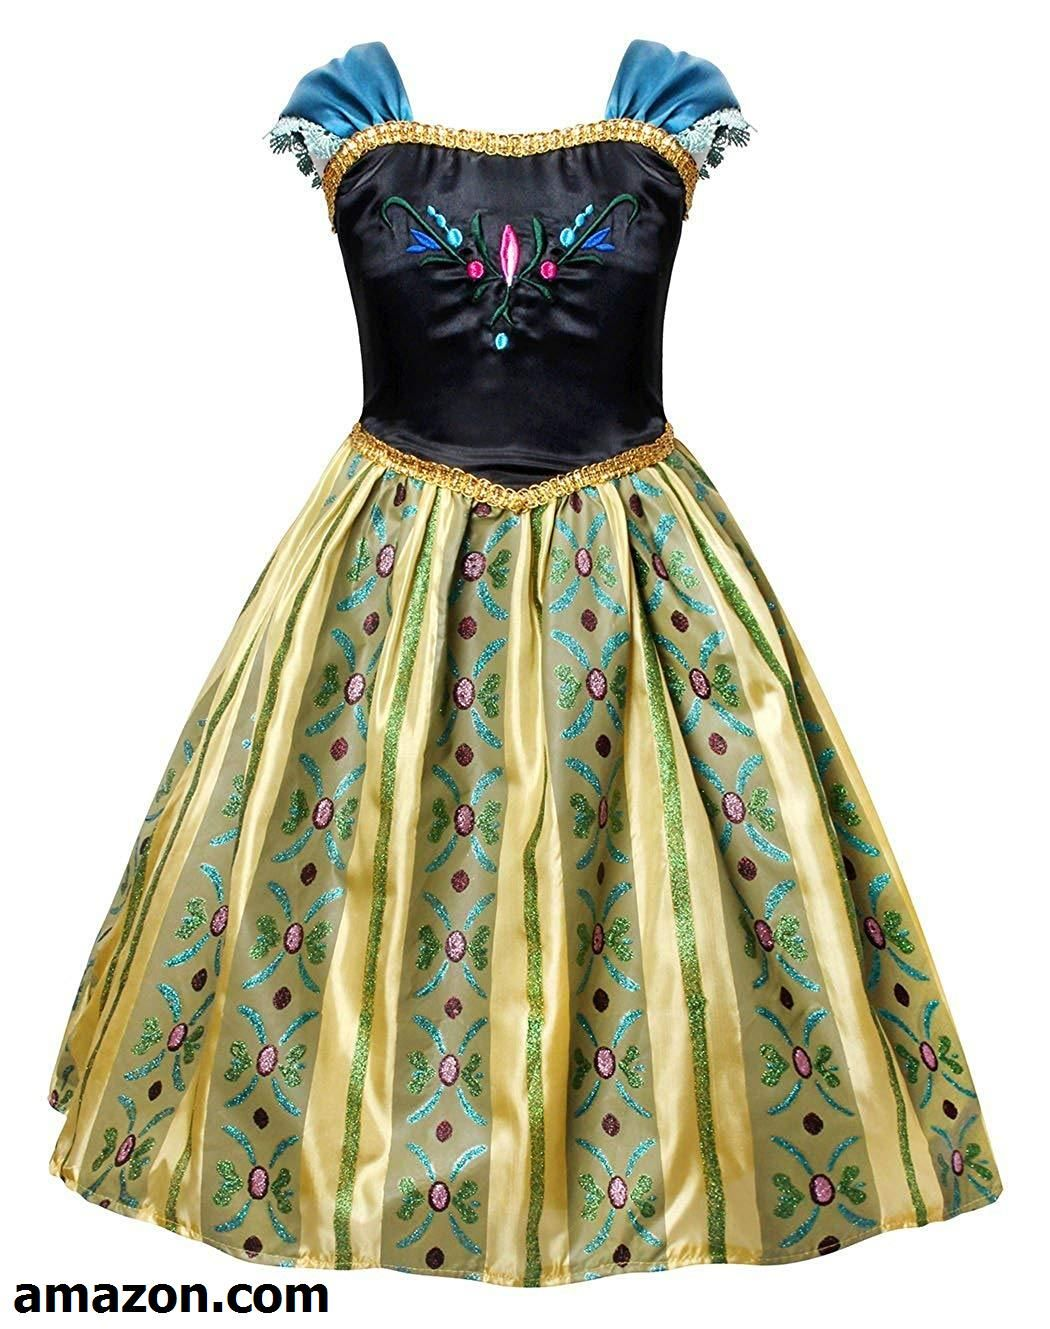 d30cb2b80dbf Cotrio Anna Coronation Dress Halloween Costumes Princess Dress up ...